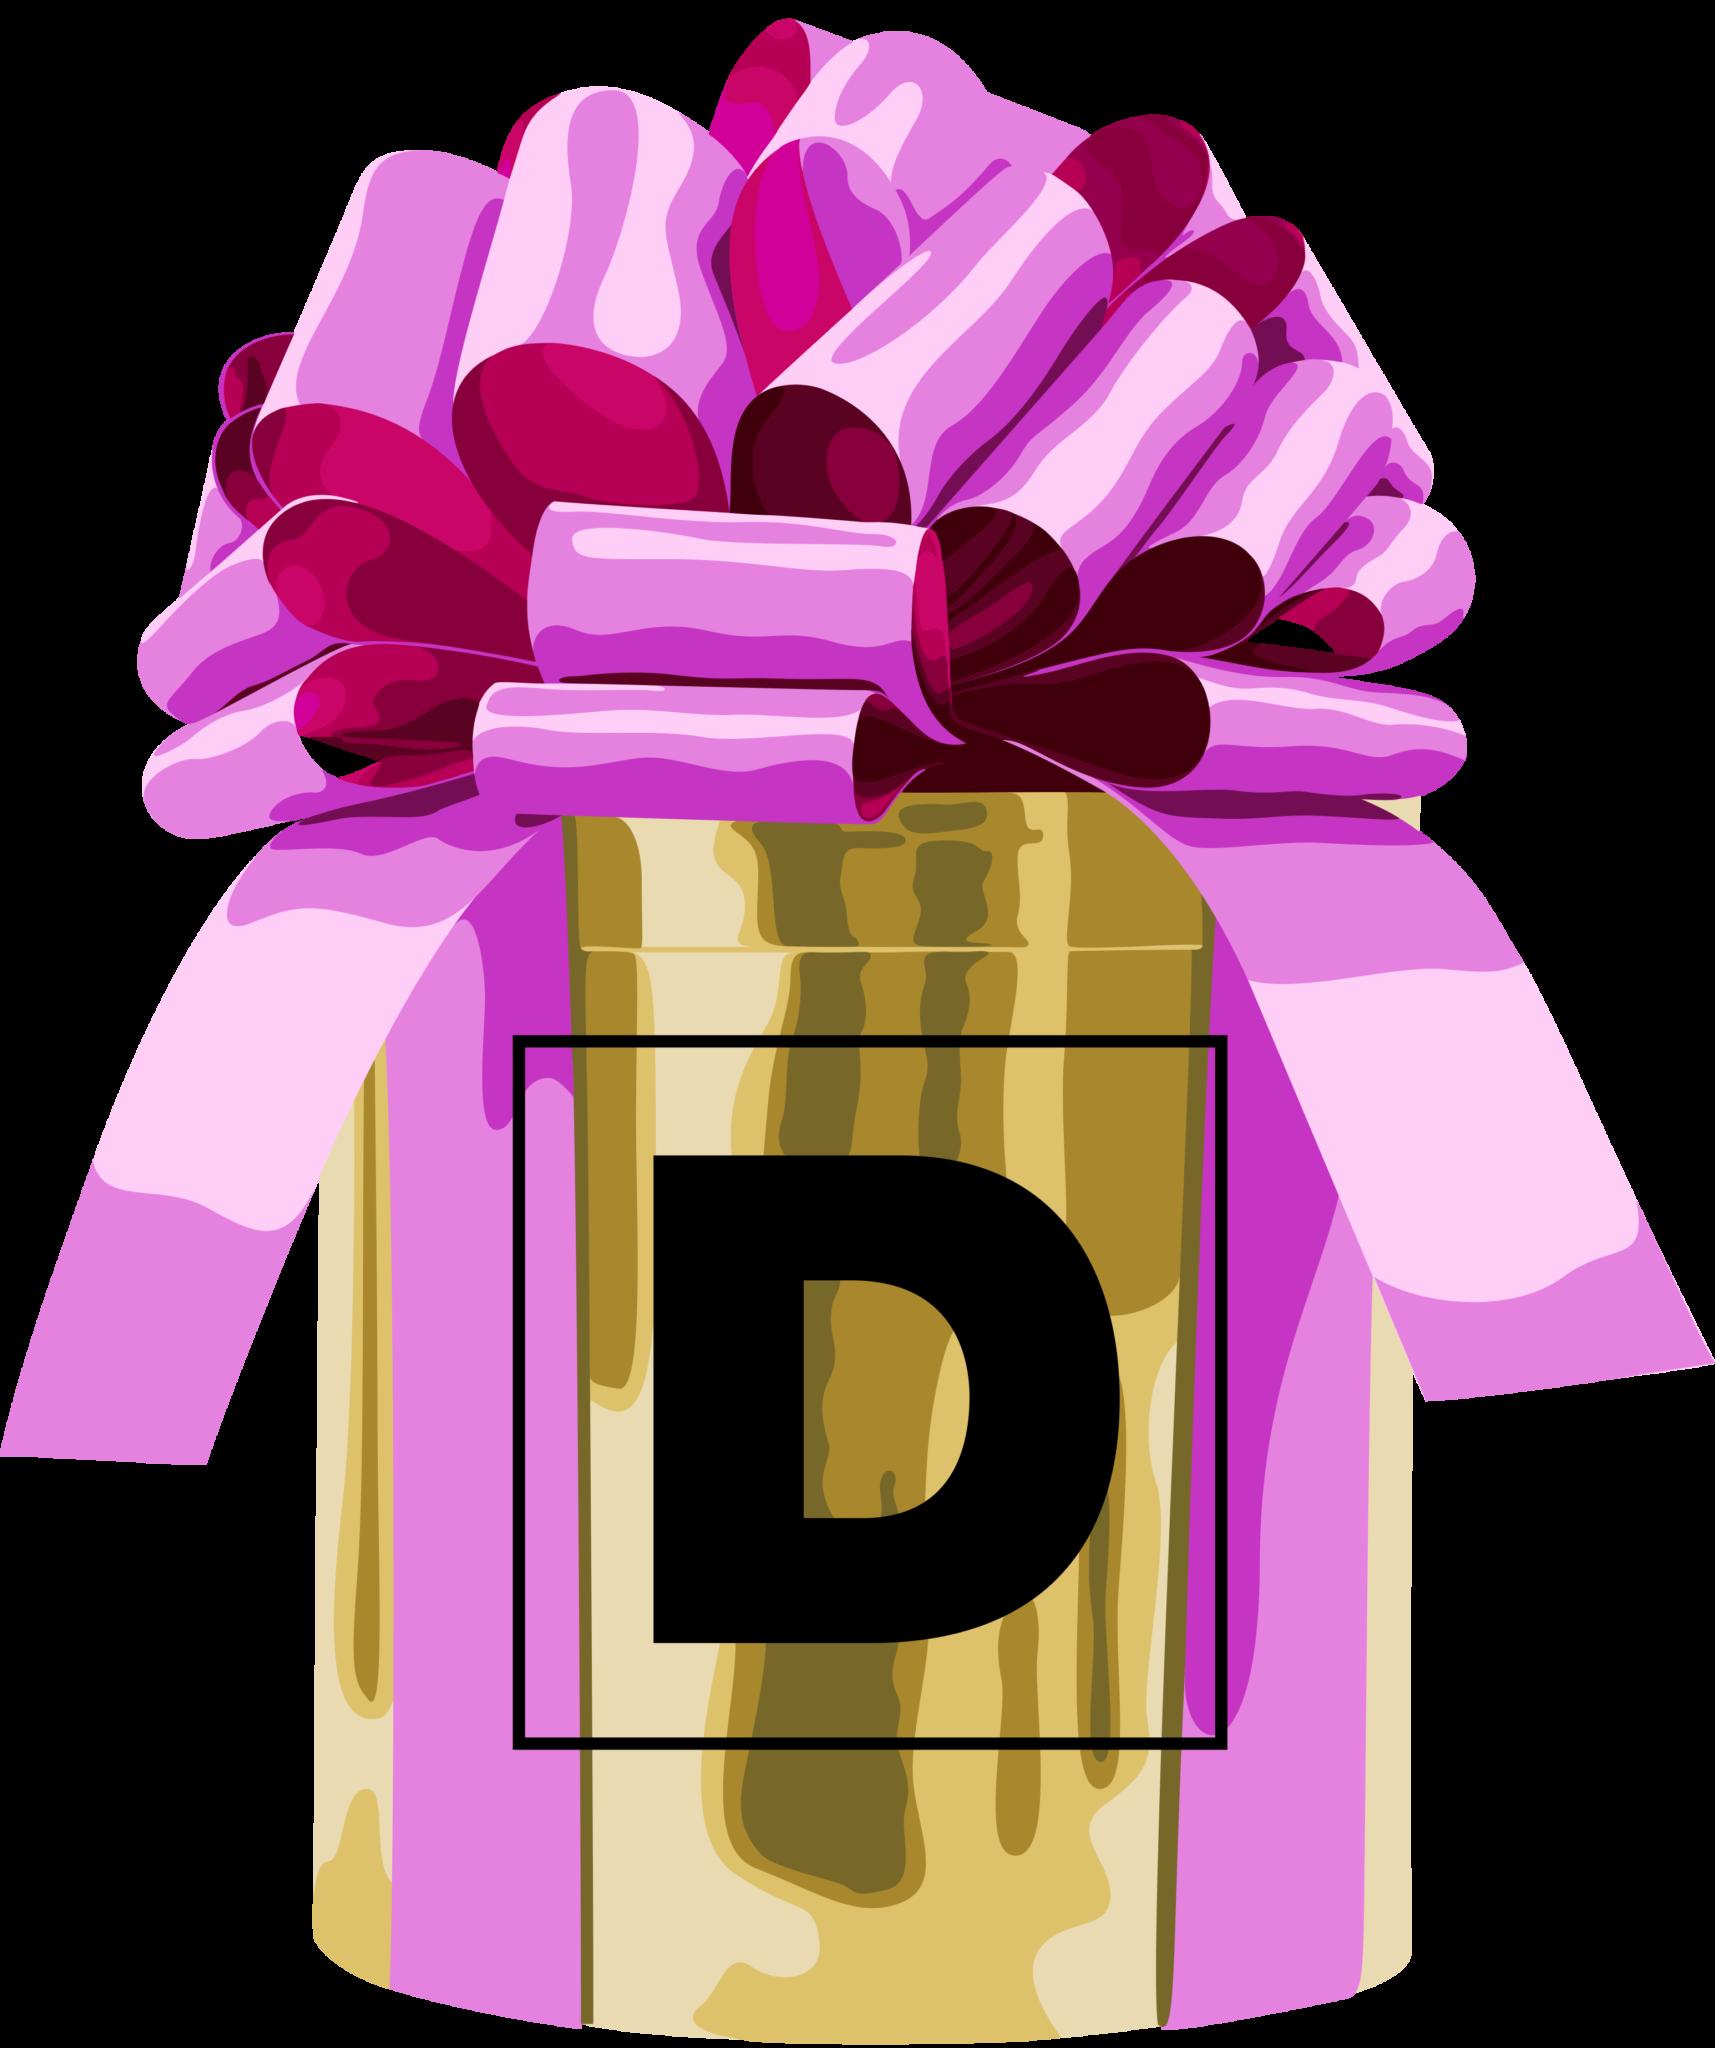 Illustration of a present